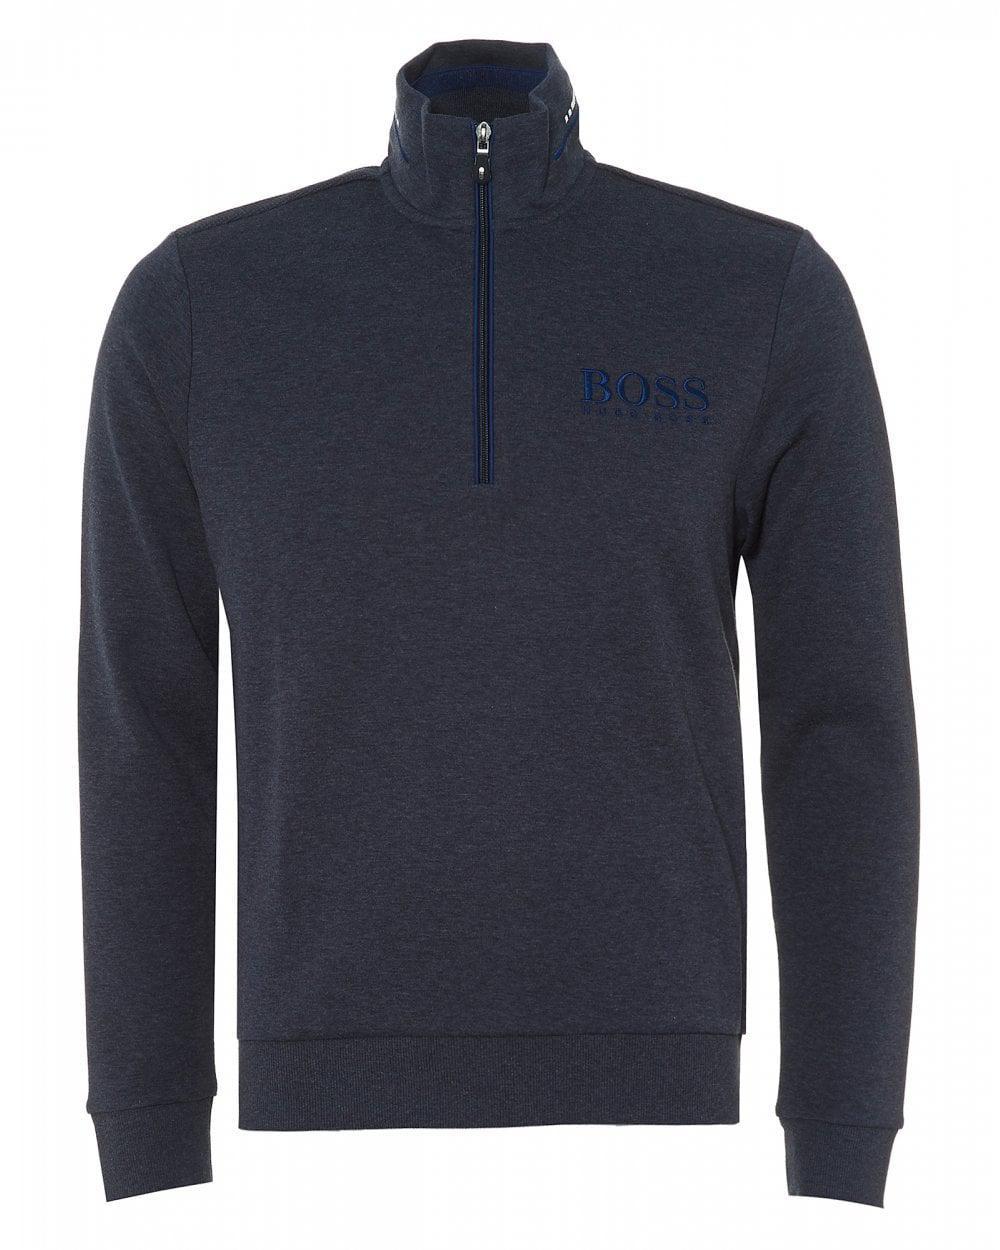 0cc18d312 BOSS 1/4 Zip Neck Sweatshirt, Night Watch Blue Regular Fit Sweat in ...